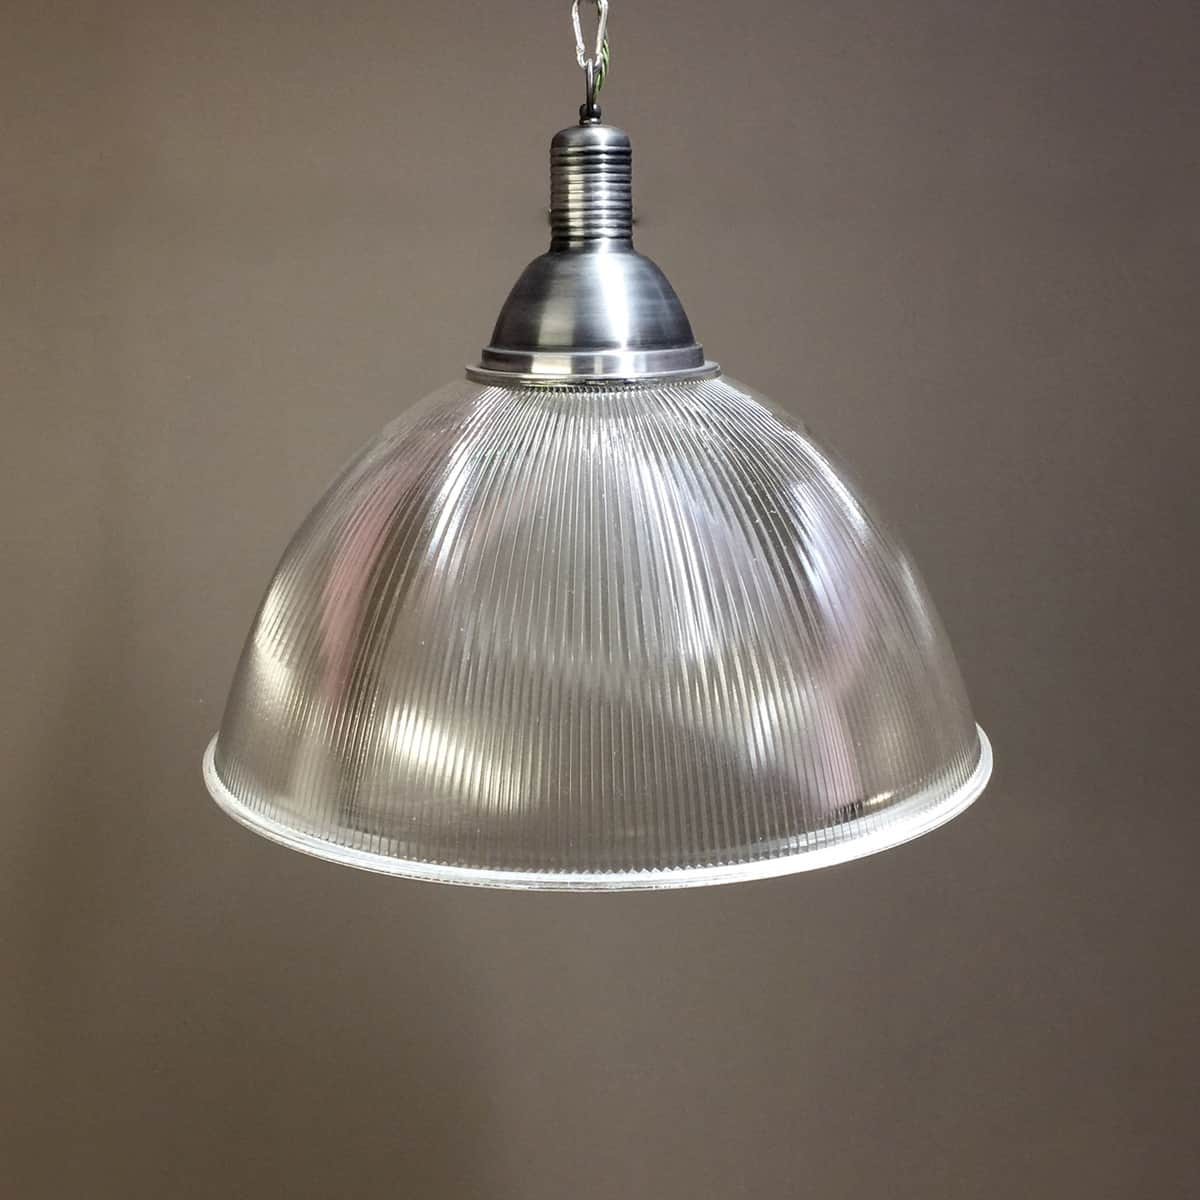 Large Vintage Industrial Prismatic Holophane Pendant Light Tinker And Toad